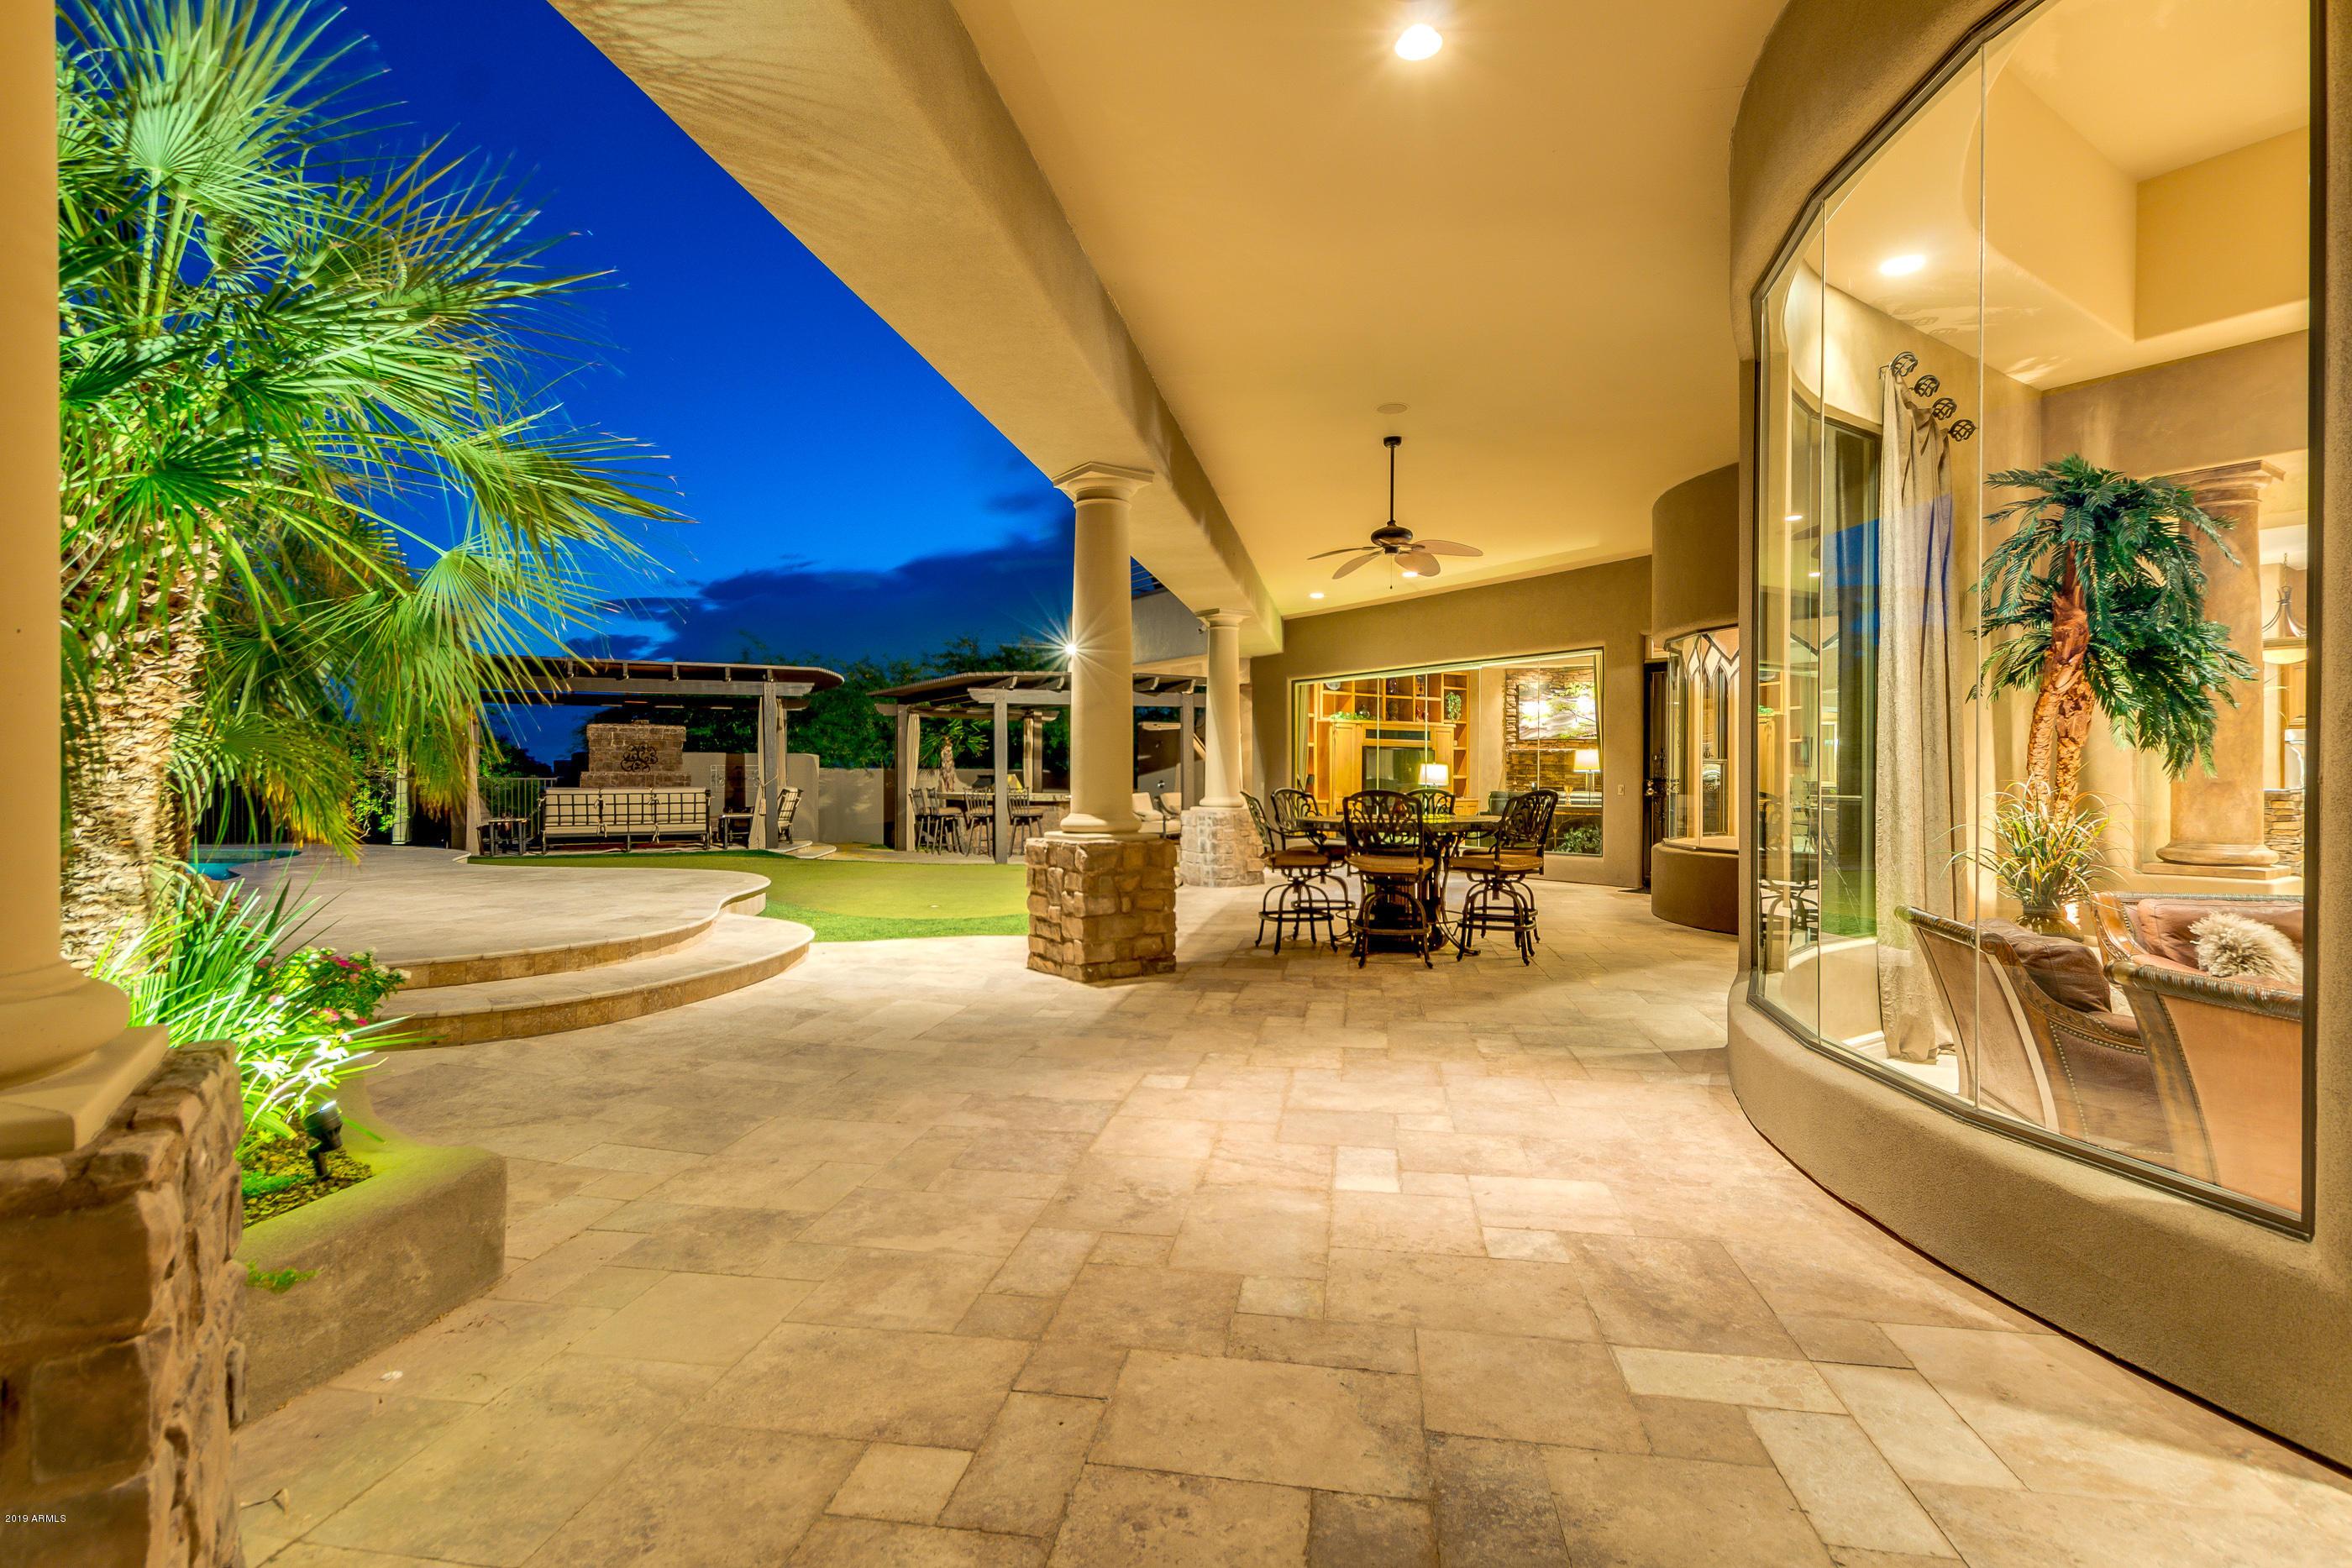 MLS 5922549 12687 E APPALOOSA Place, Scottsdale, AZ 85259 Scottsdale AZ Private Pool